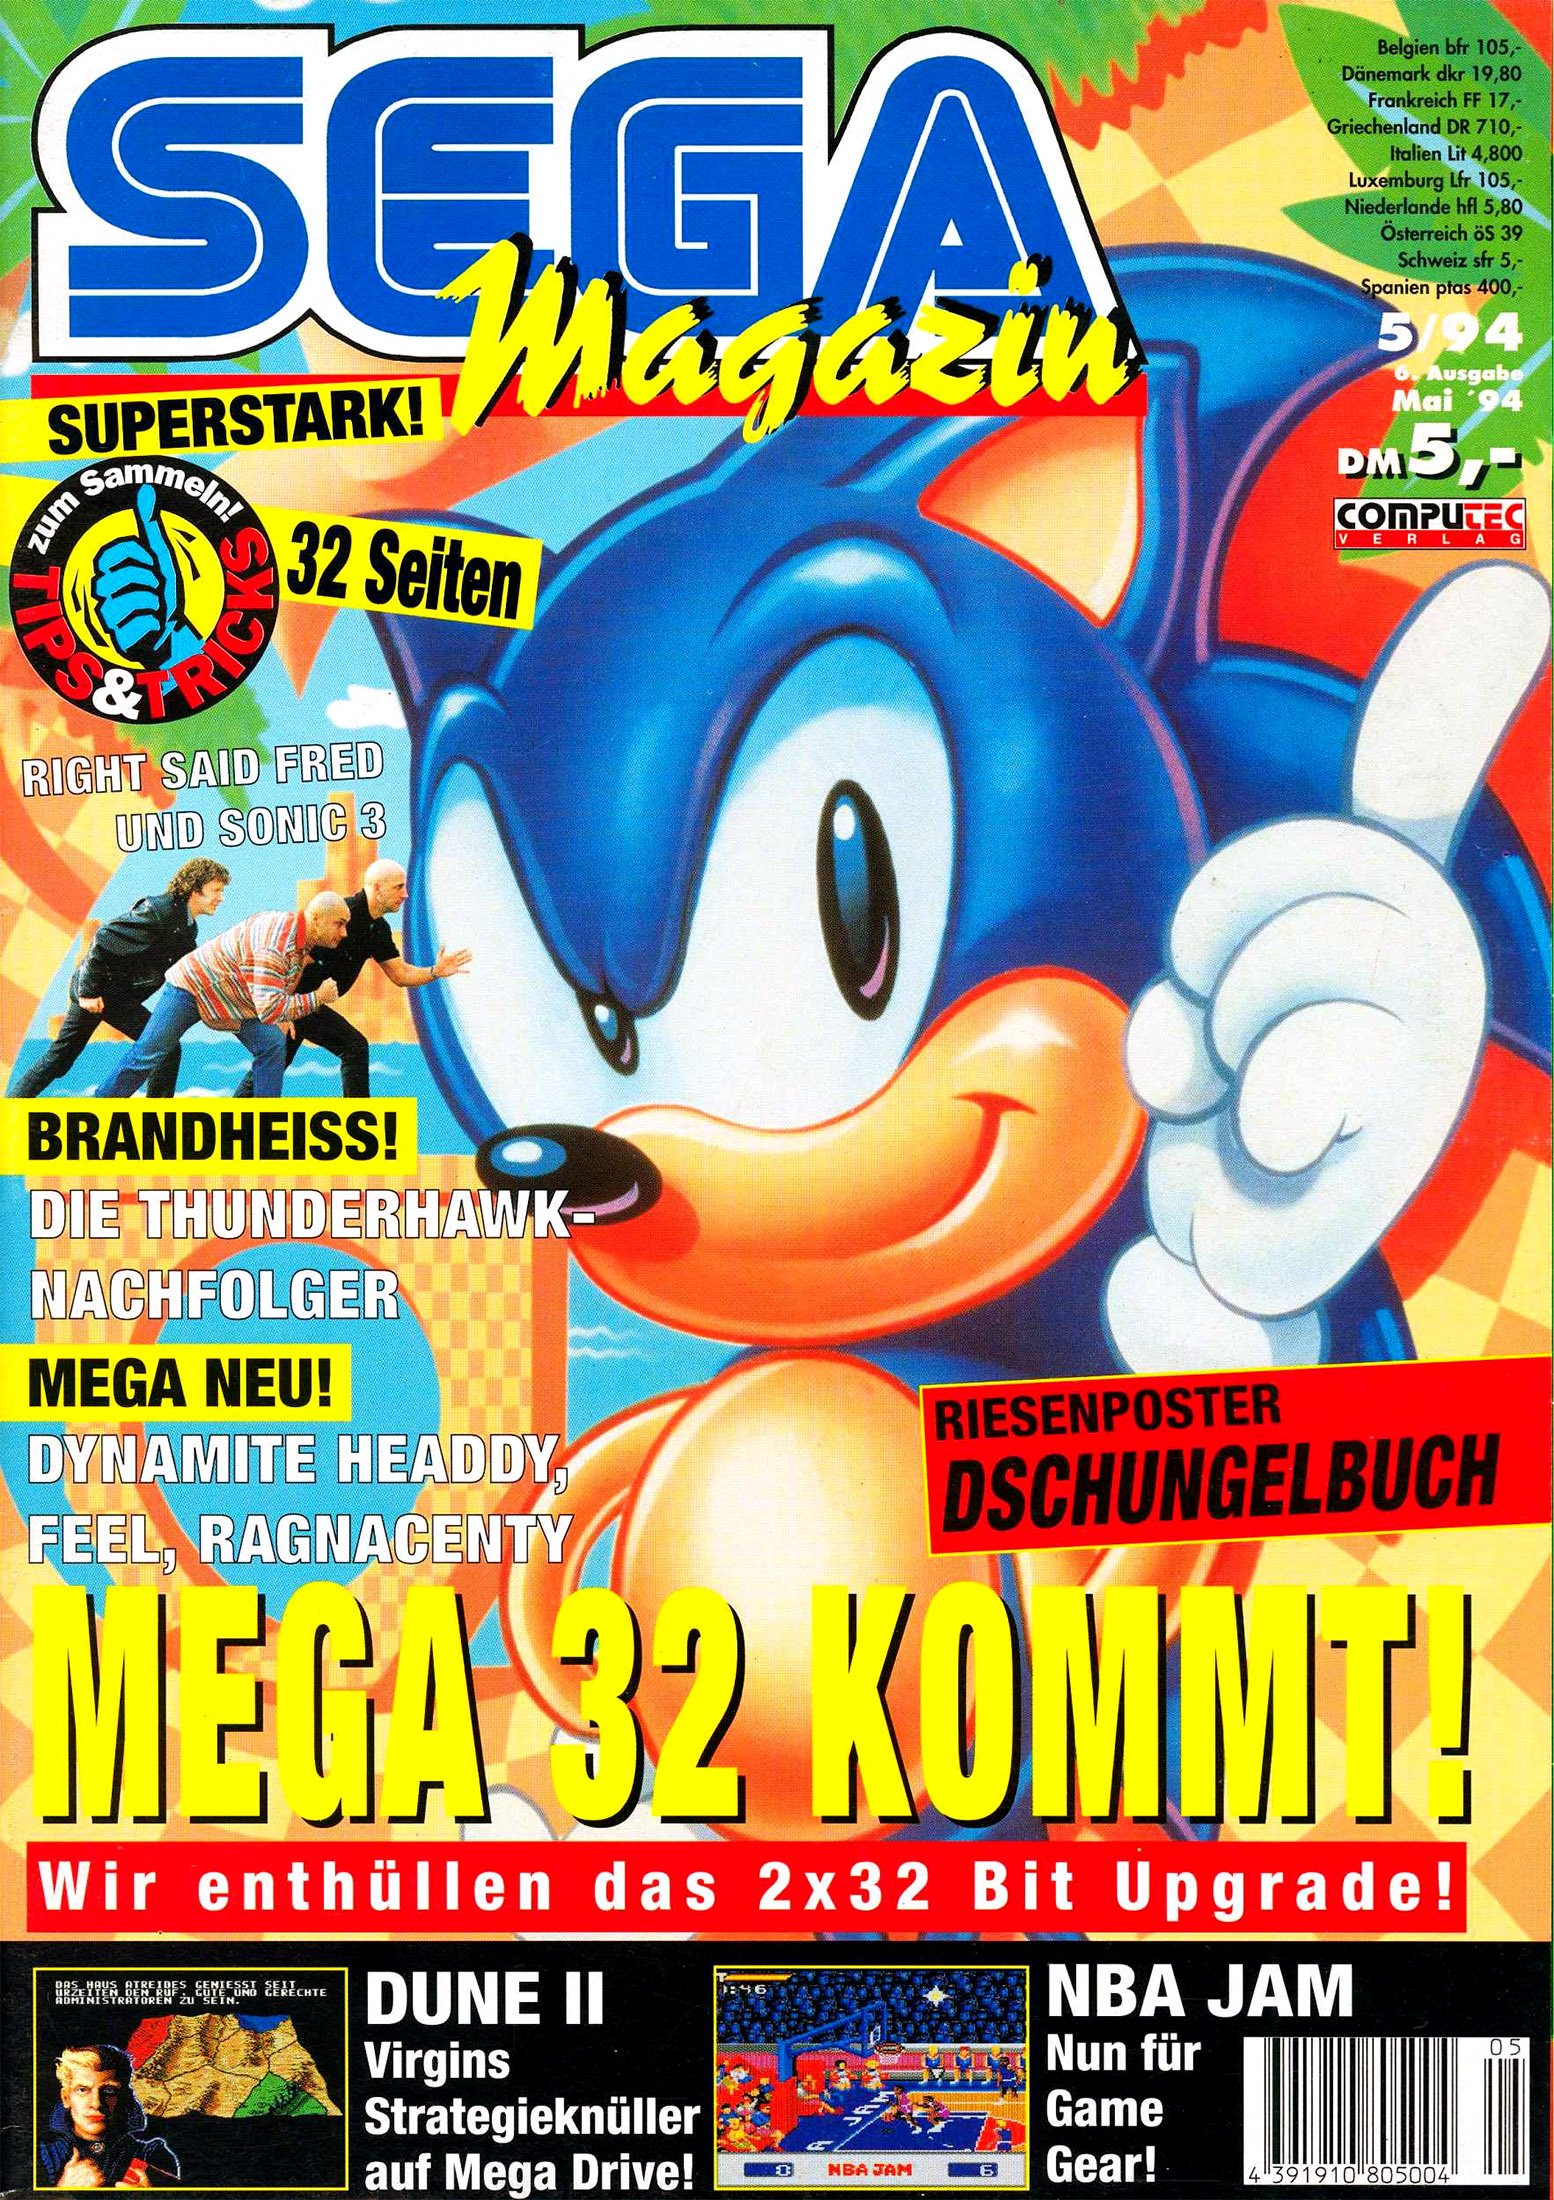 Sega Magazin Issue 06 (May 1994)